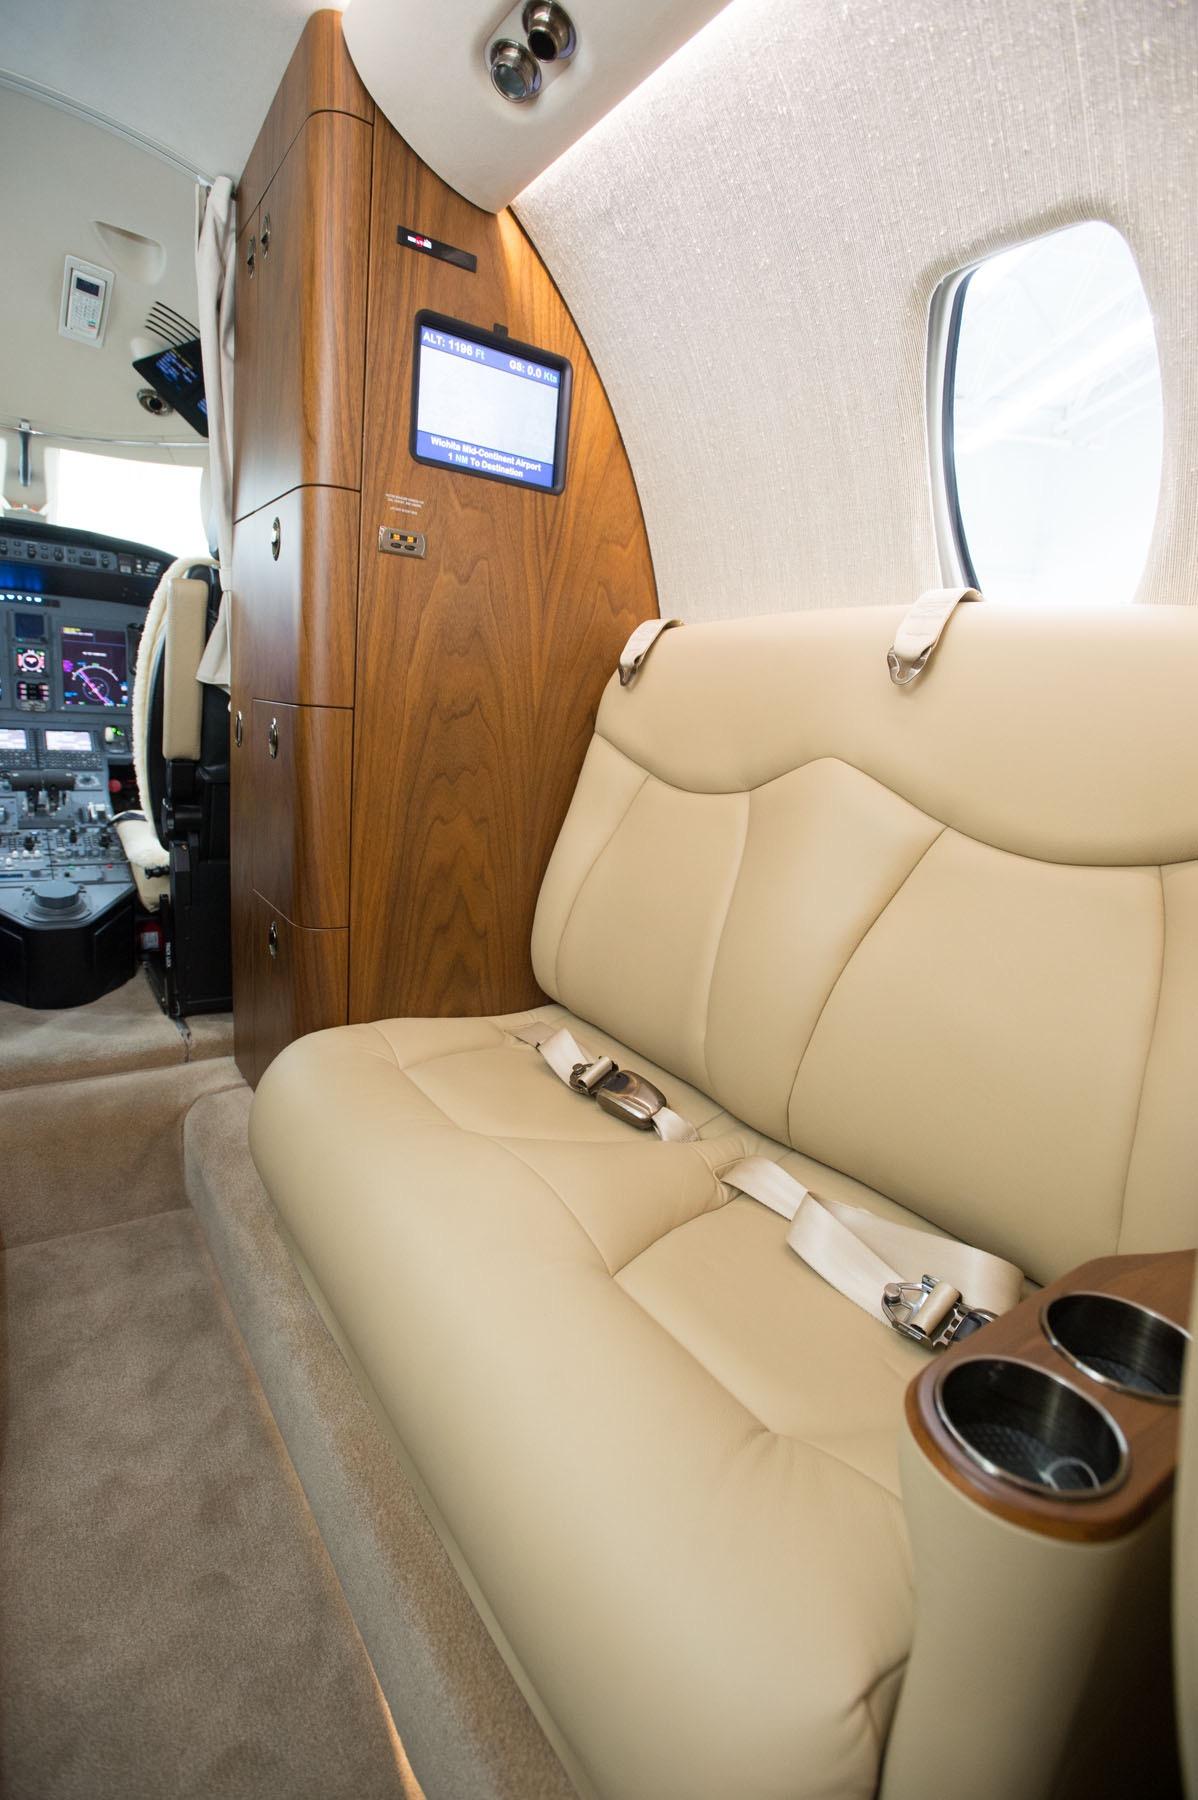 Citation-XLS+_Mid Jet_Int-3_Legacy_Aviation_Private_Jet_NetJets_Jet_Charter_TEB_VNY_MIA_PBI_FRG_SFO_FLL_FXE_BED.jpg